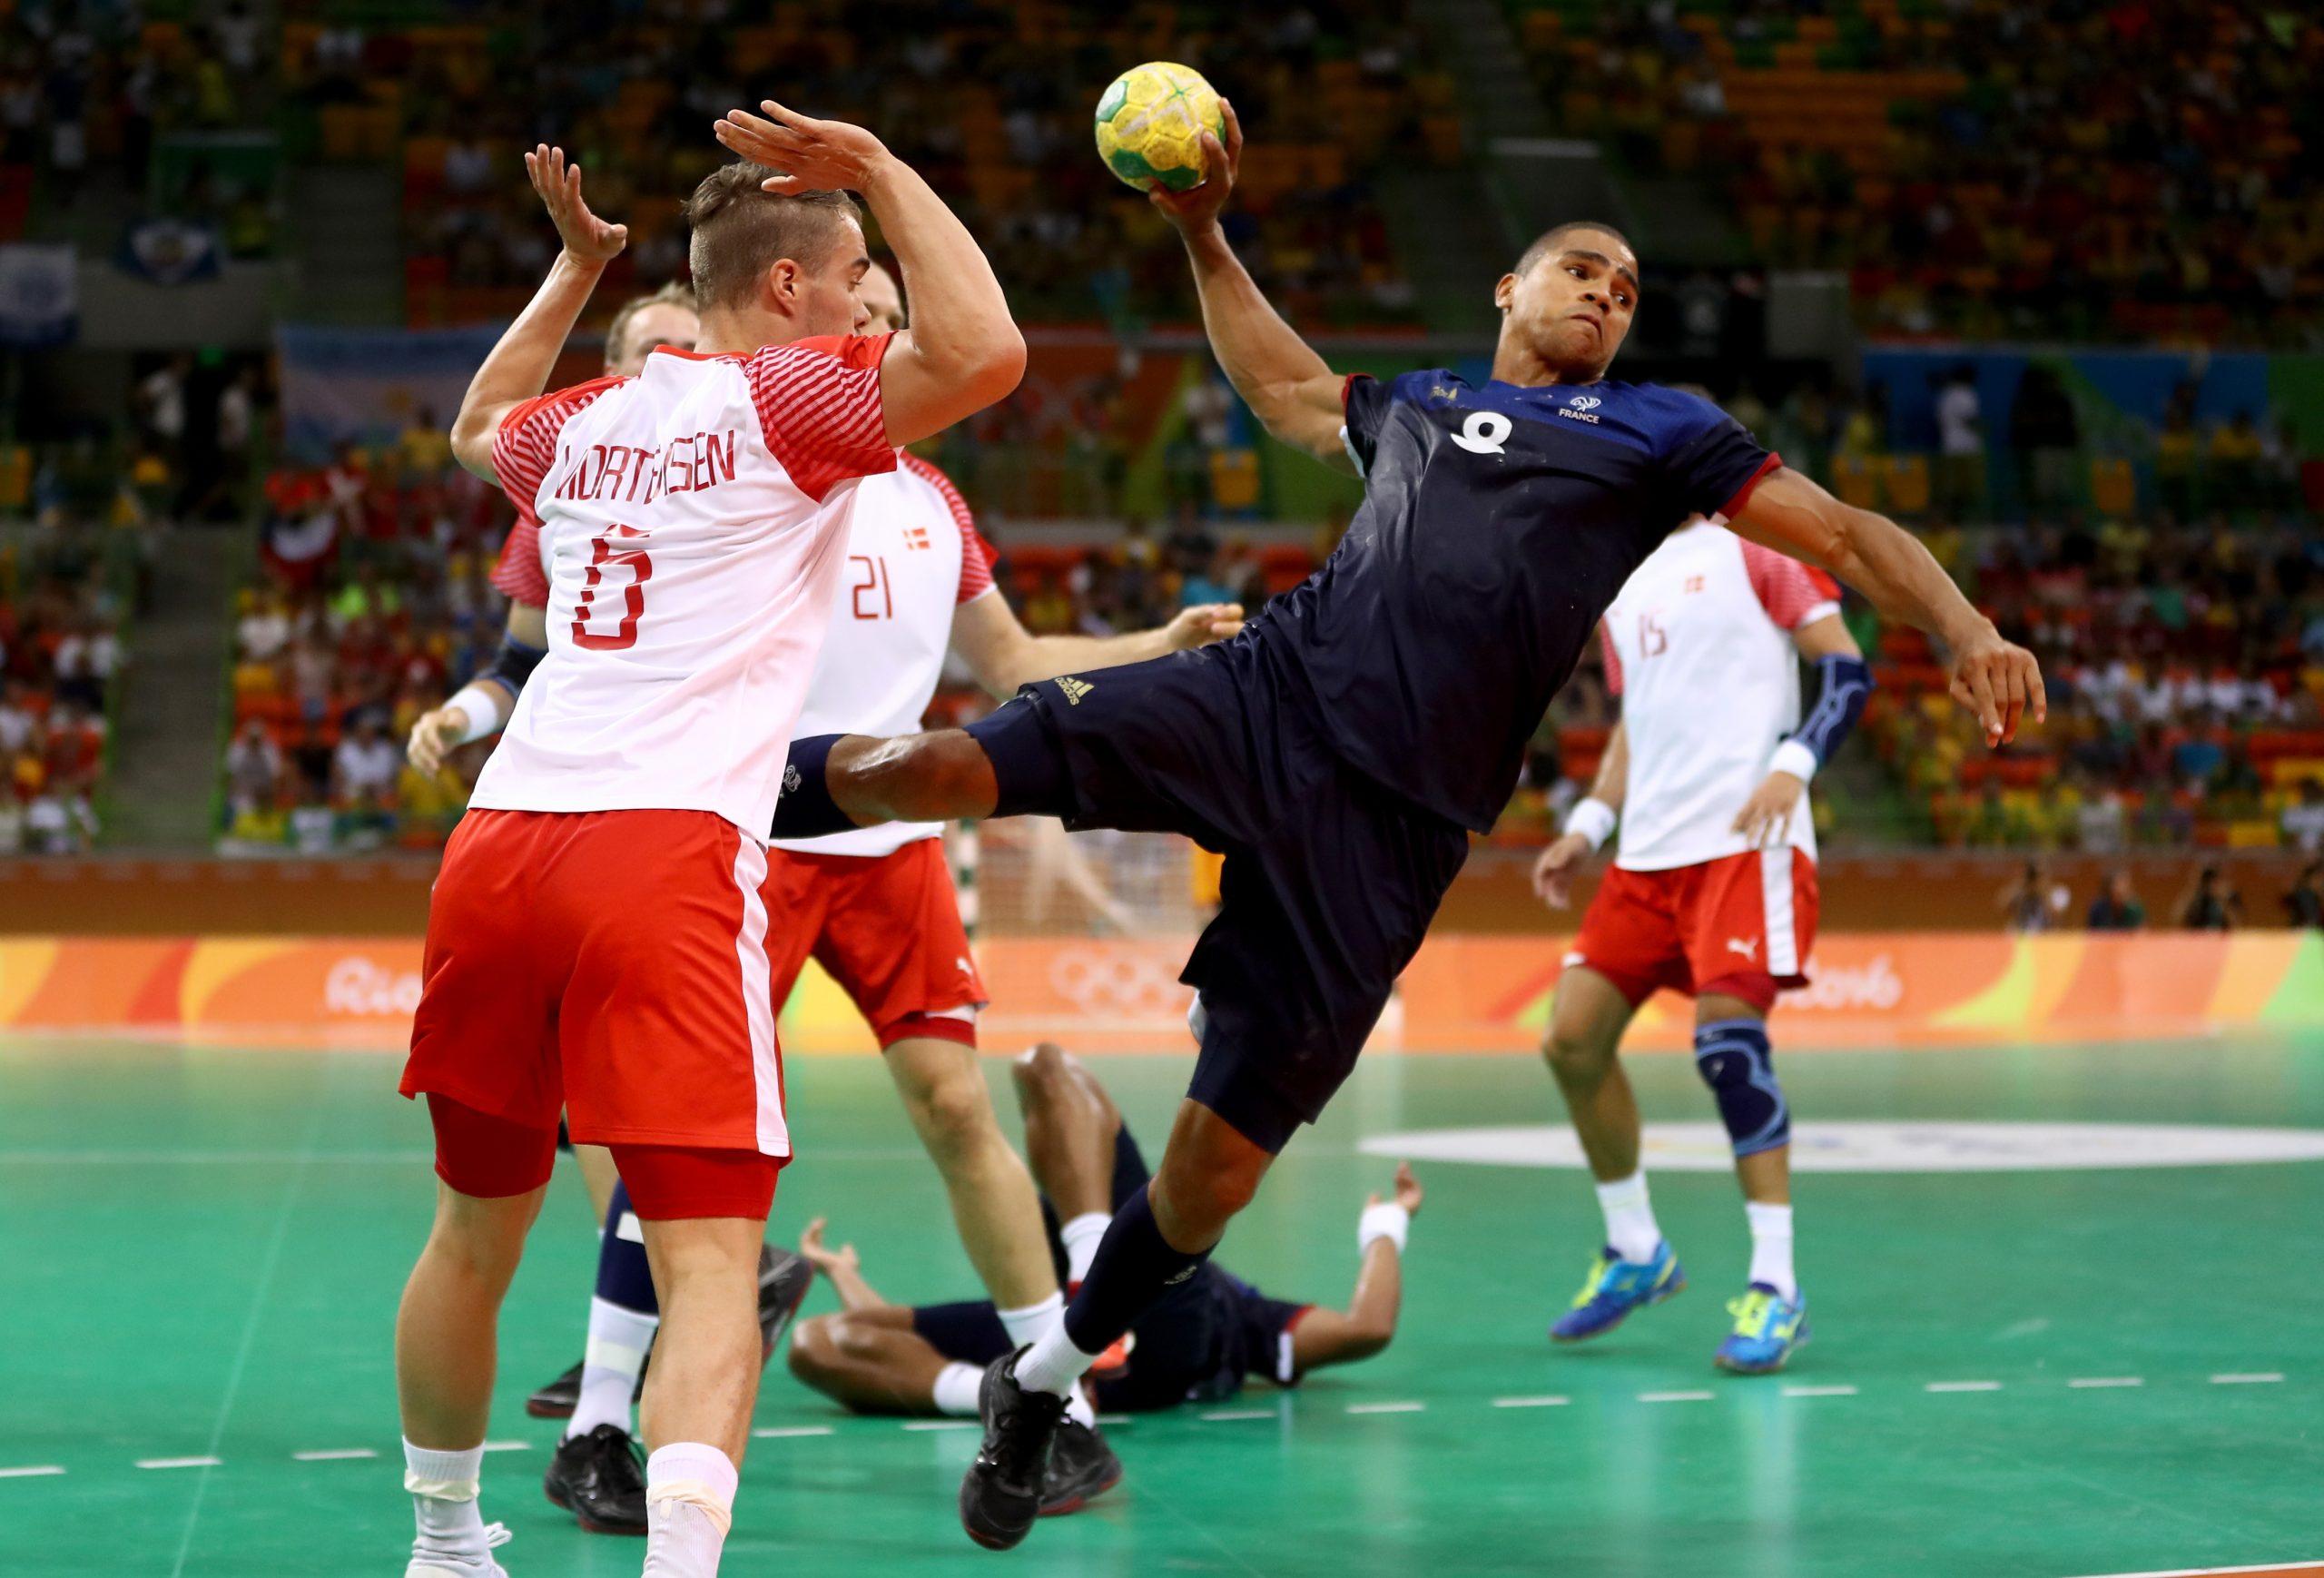 Joueur de handball en train de tirer en extension.